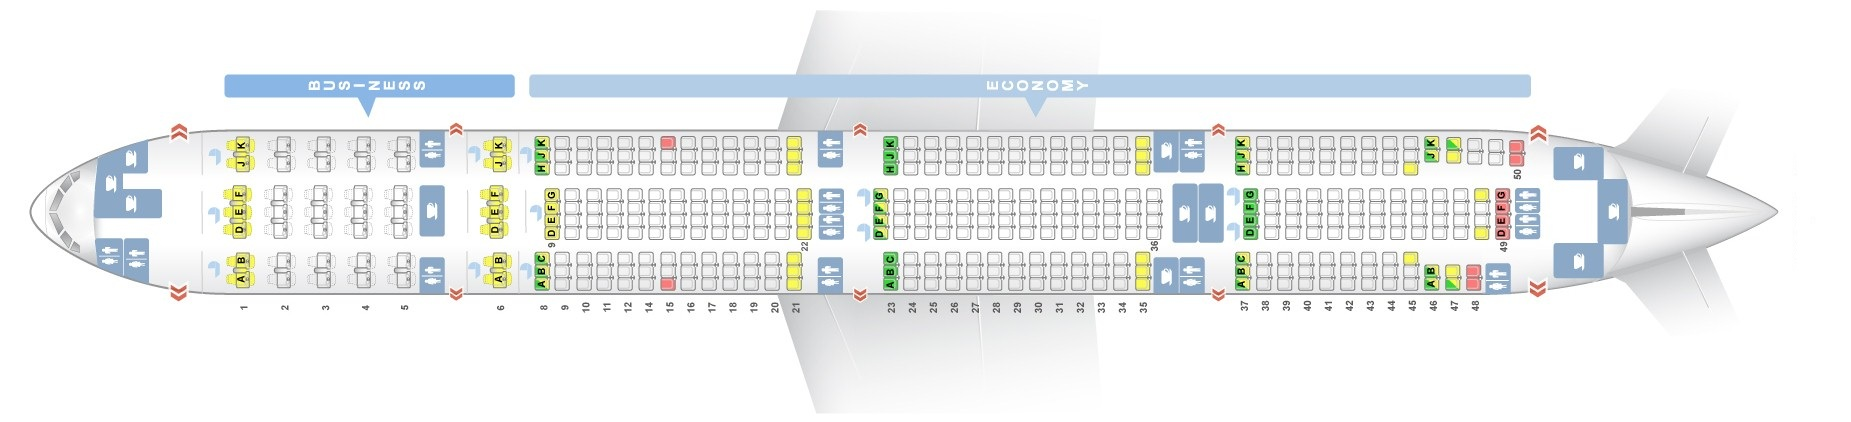 Emirates_Airlines_Boeing_777-300_3